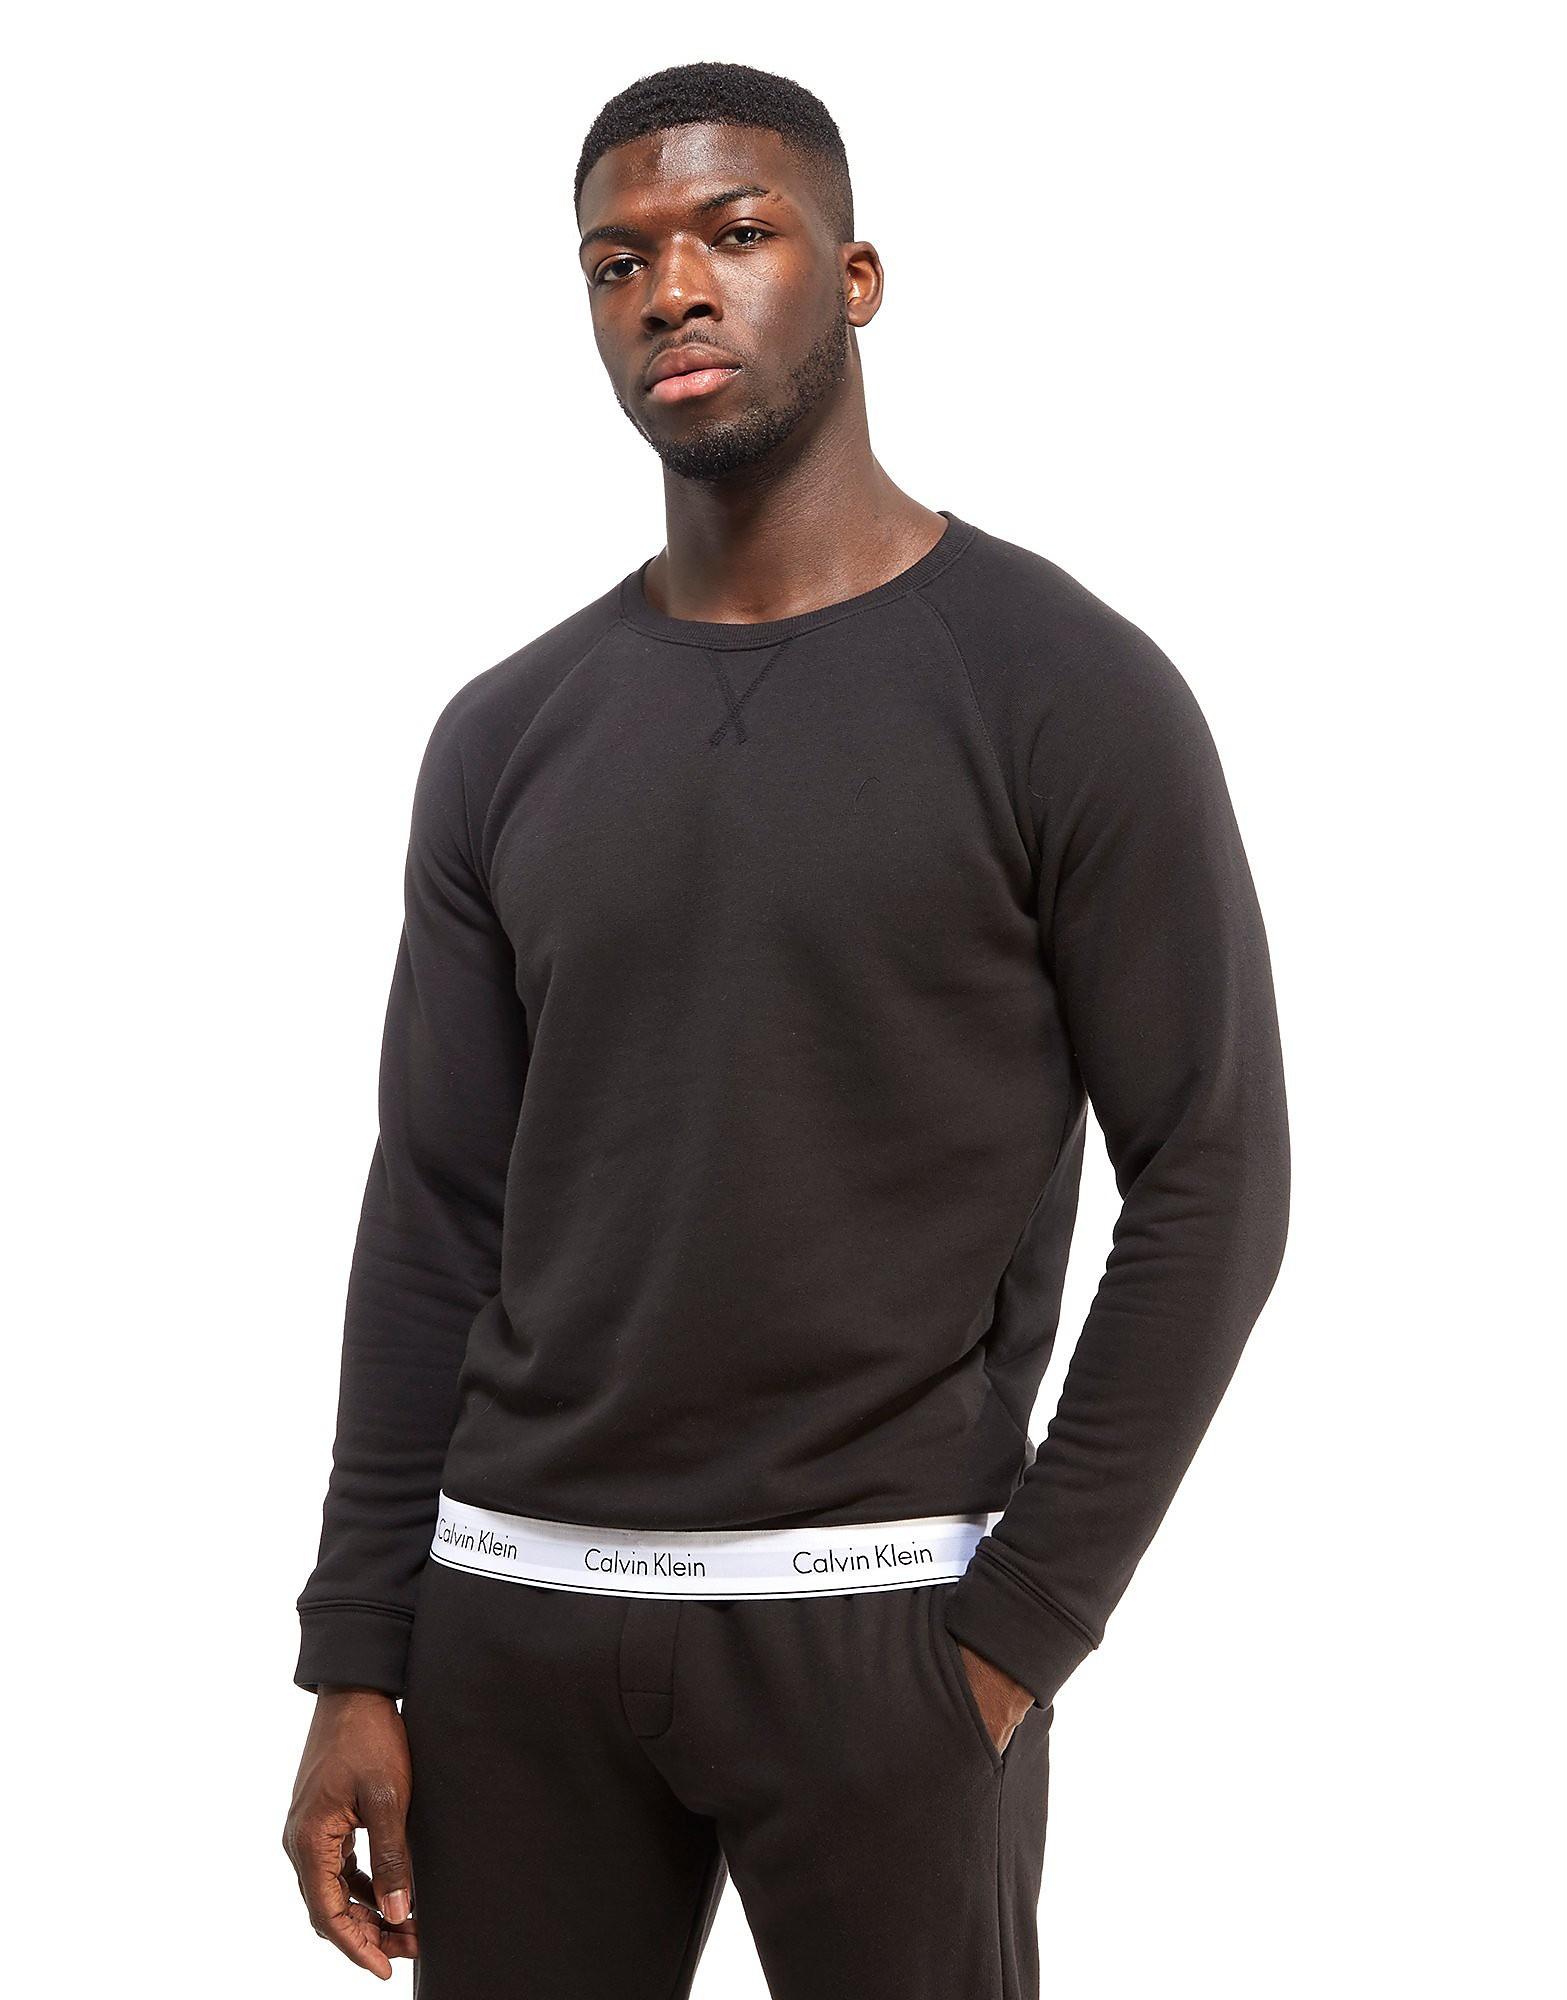 Calvin Klein Tape Sweatshirt